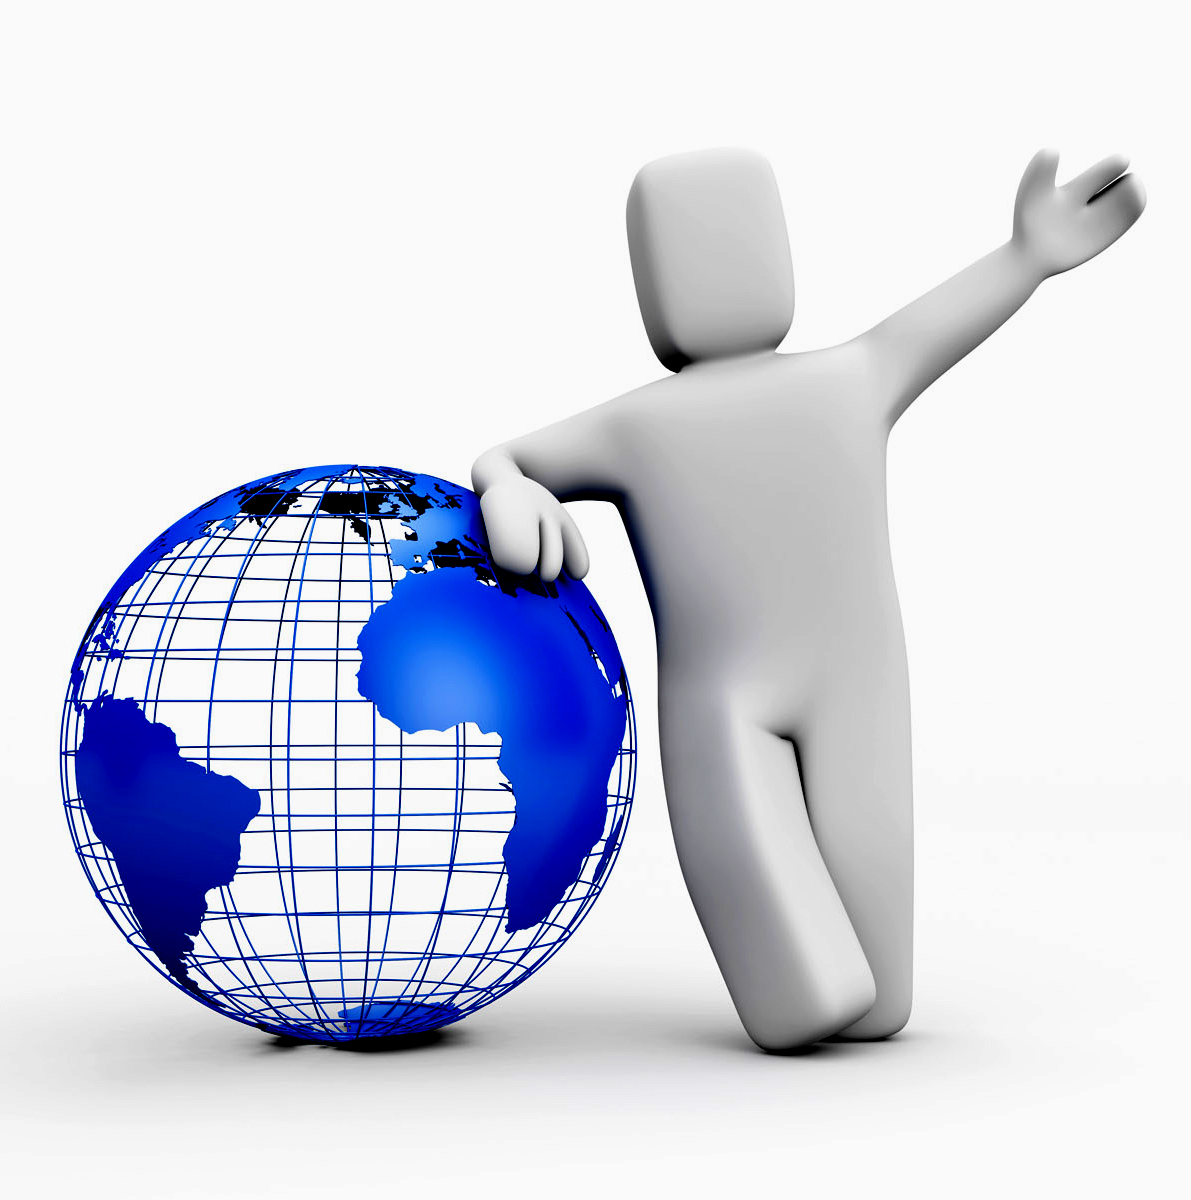 Scia Engineer 2014 Download | Software Market Ltd